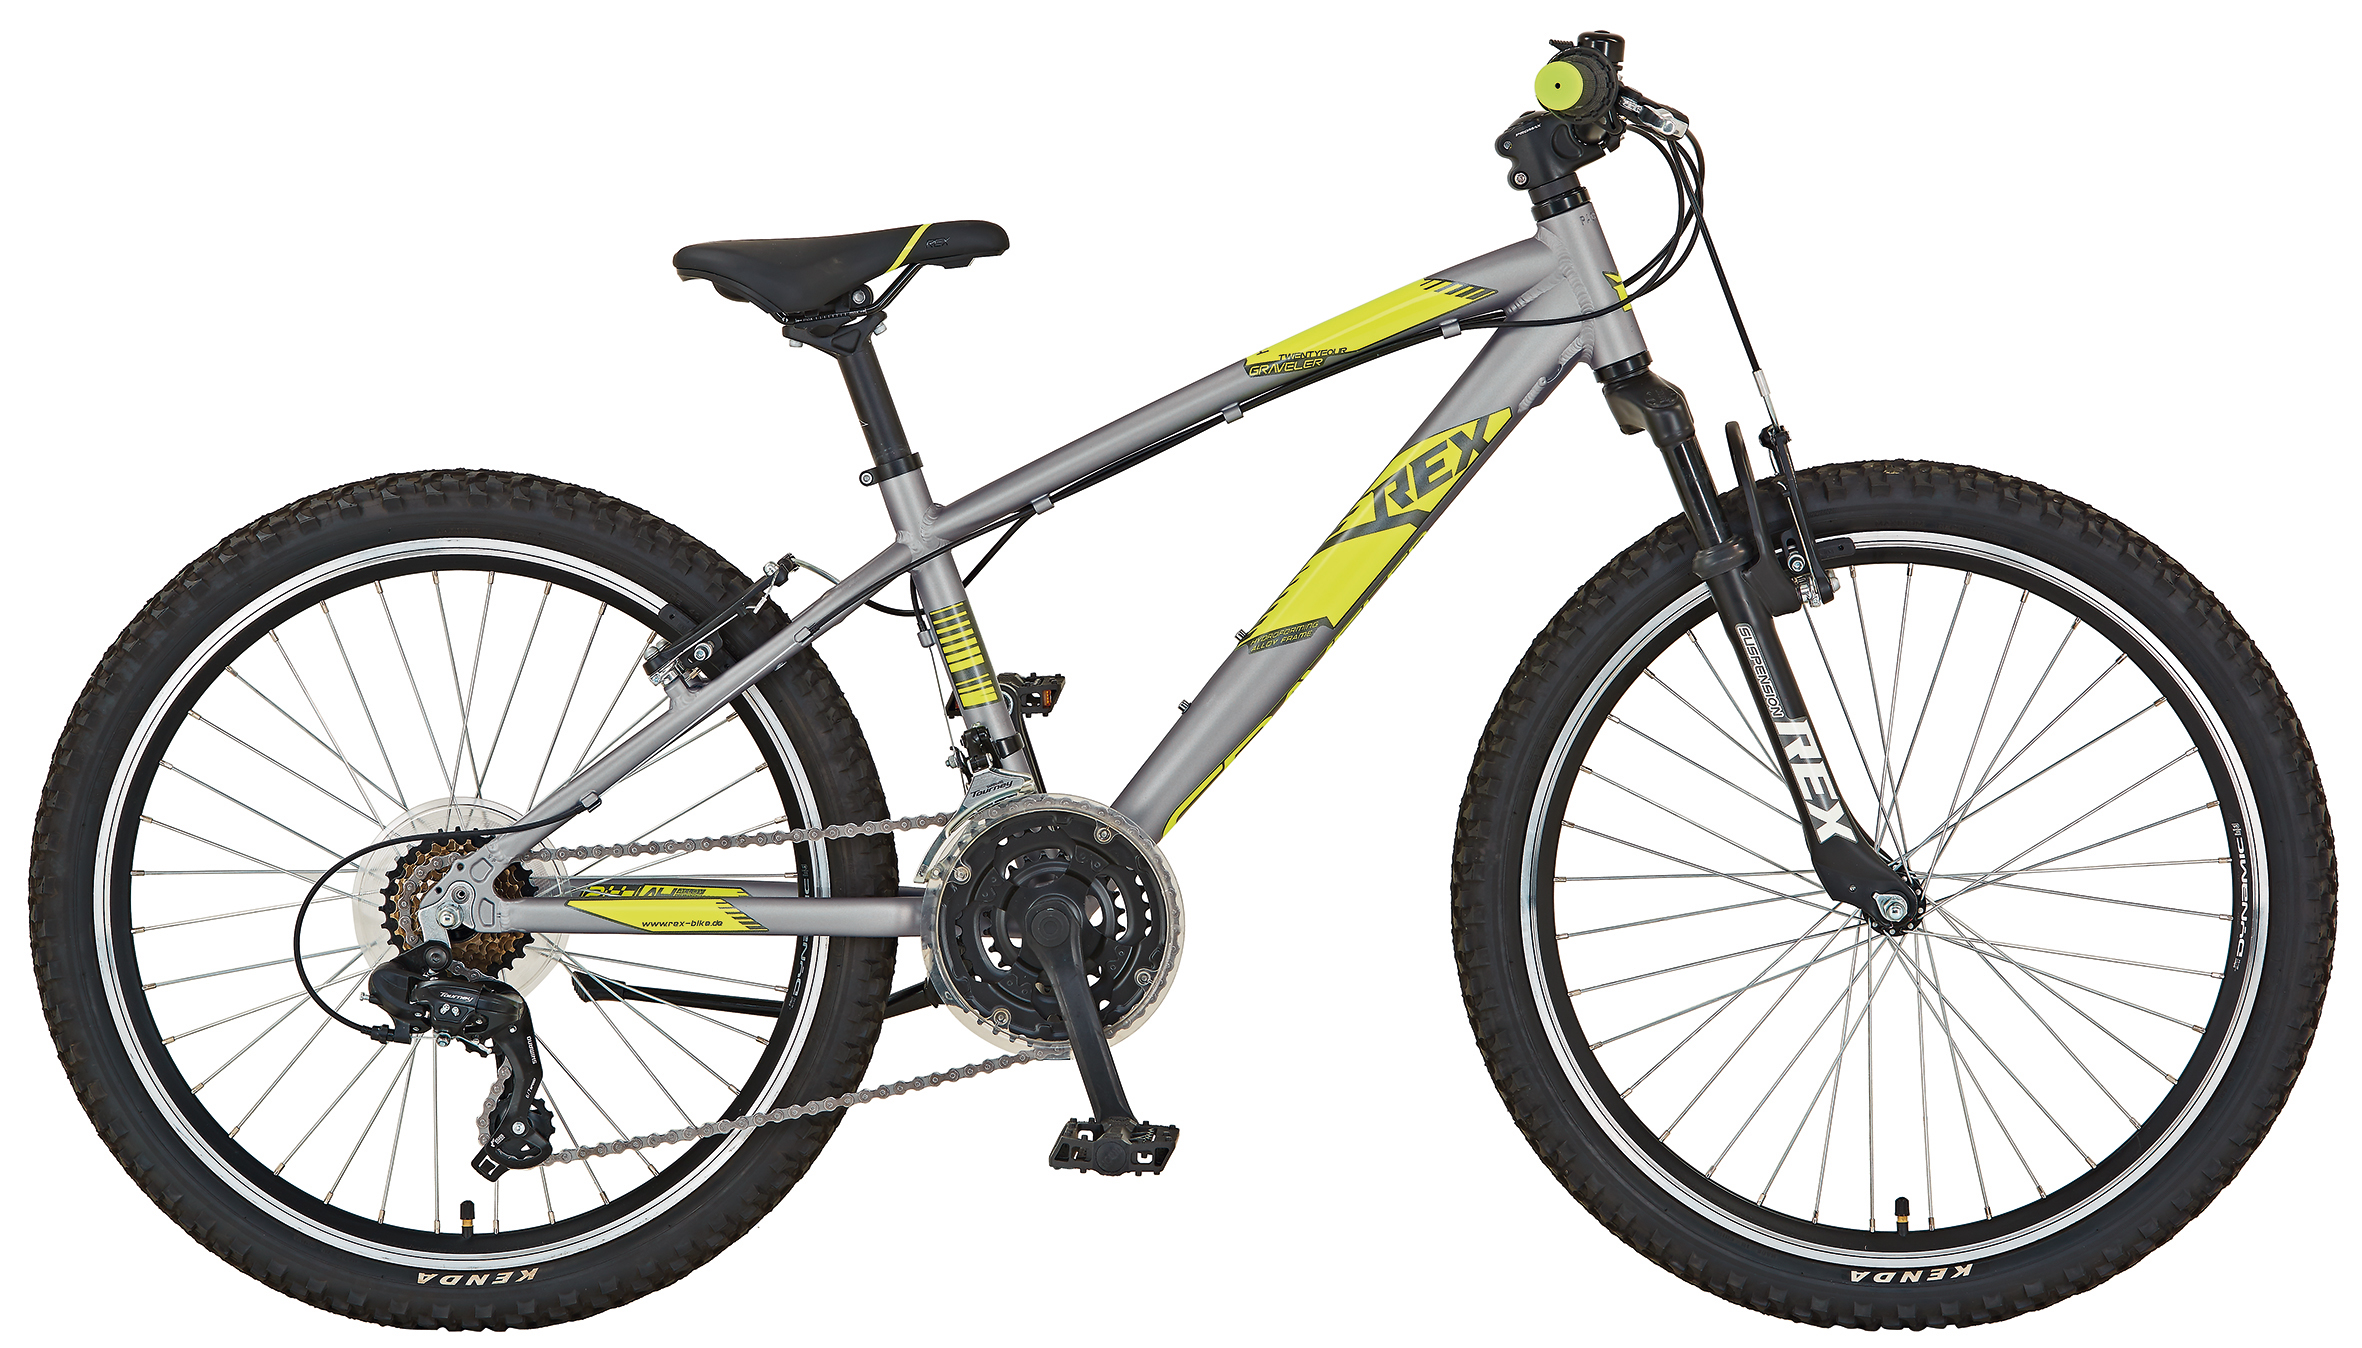 "Rex Bike Jugendfahrrad / Graveler Twentyfour Kids Bike 24"" Bild 1"